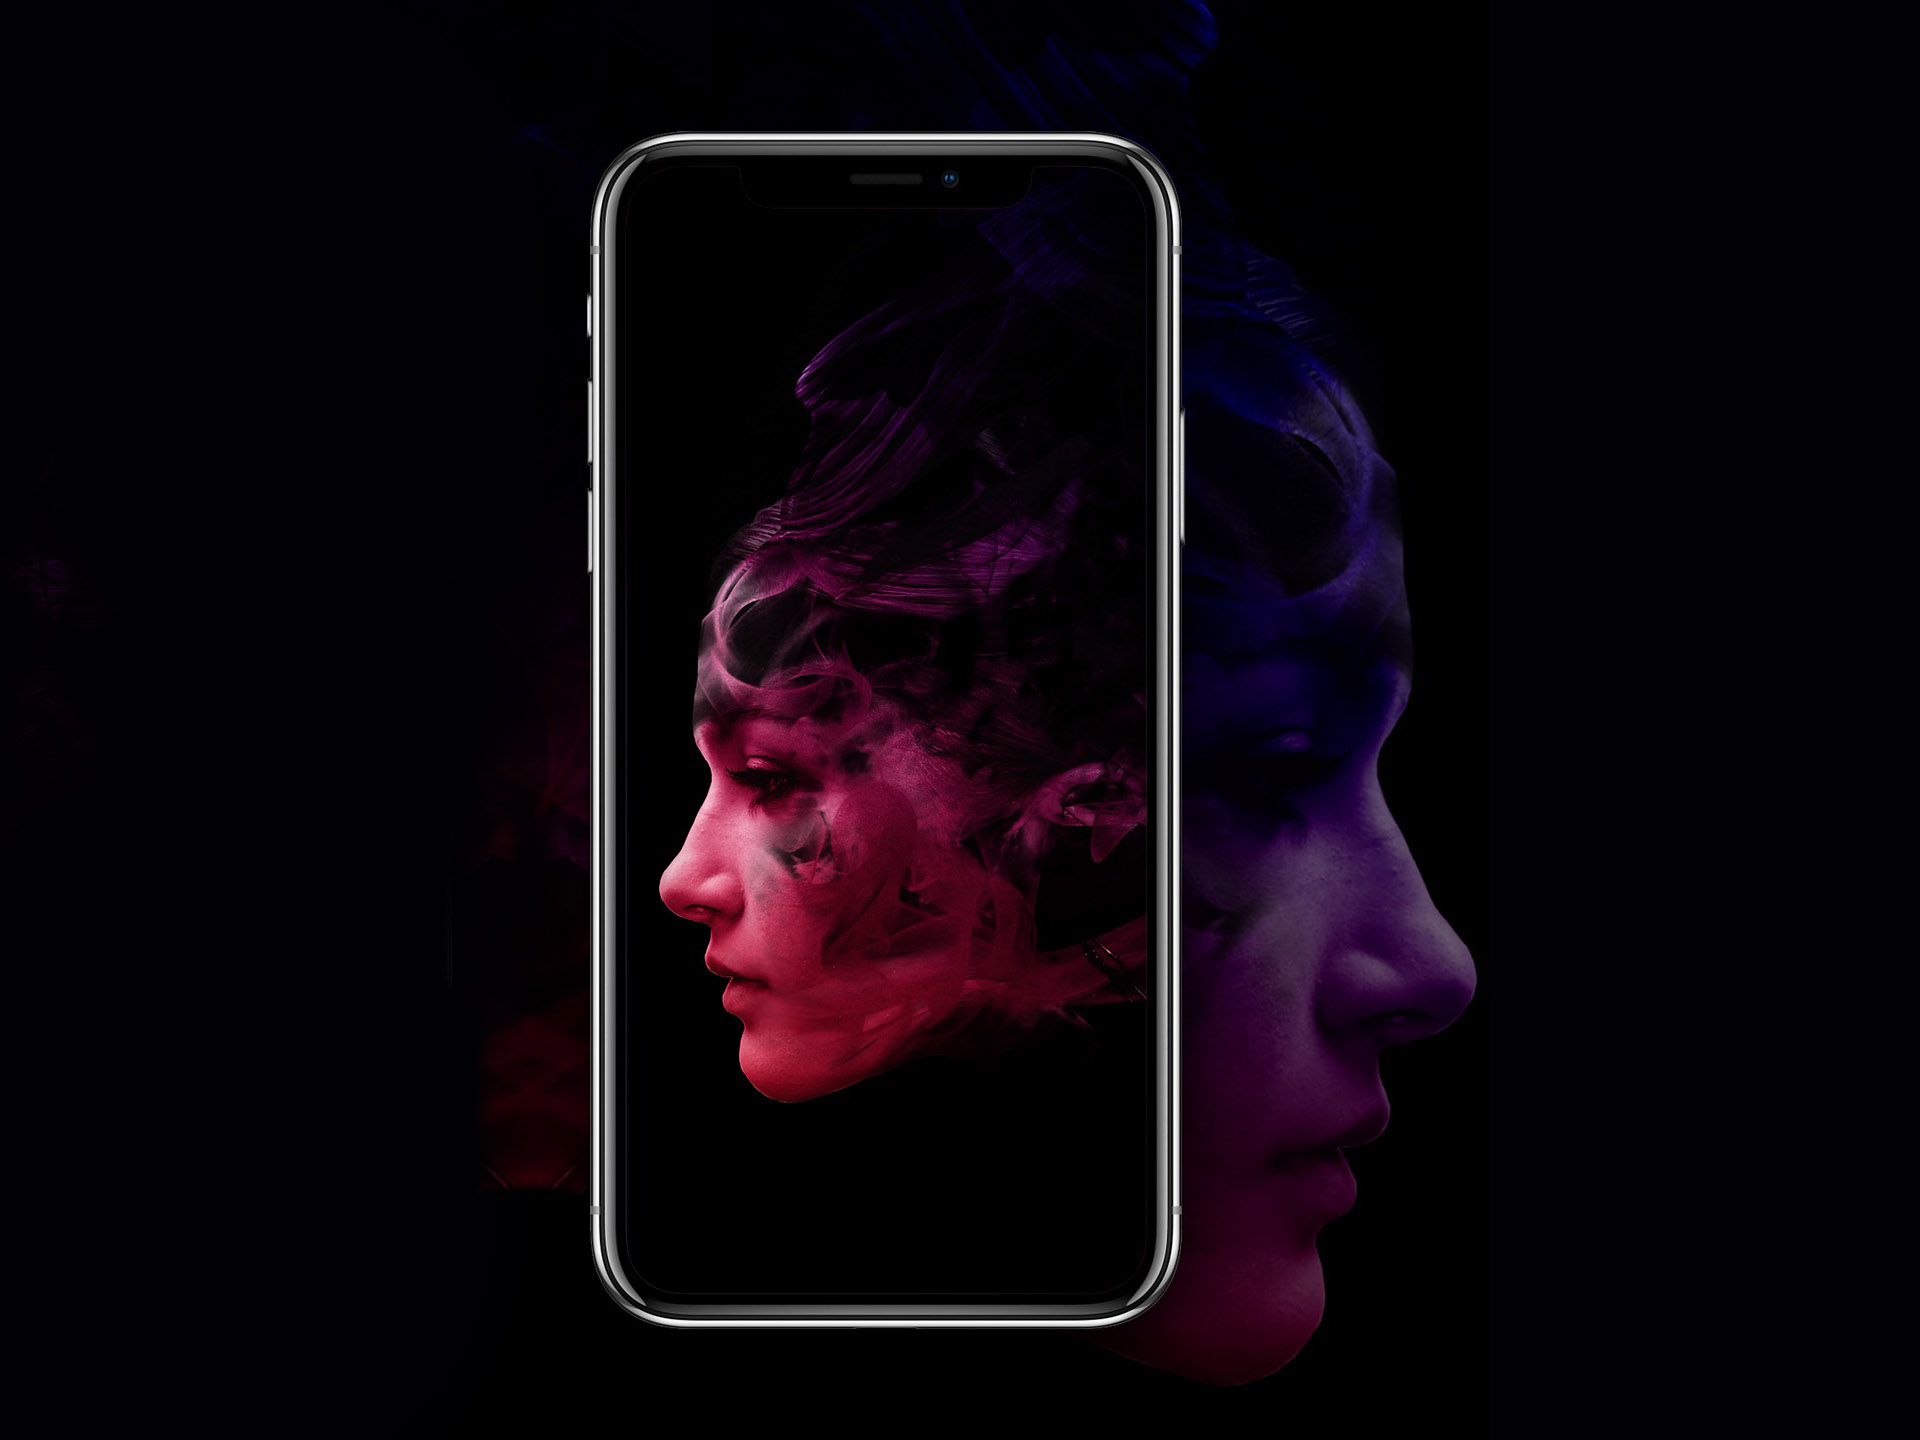 Kuo-iPhones-2020-mit-neuen-Gr-en-5G-amp-OLED-Displays